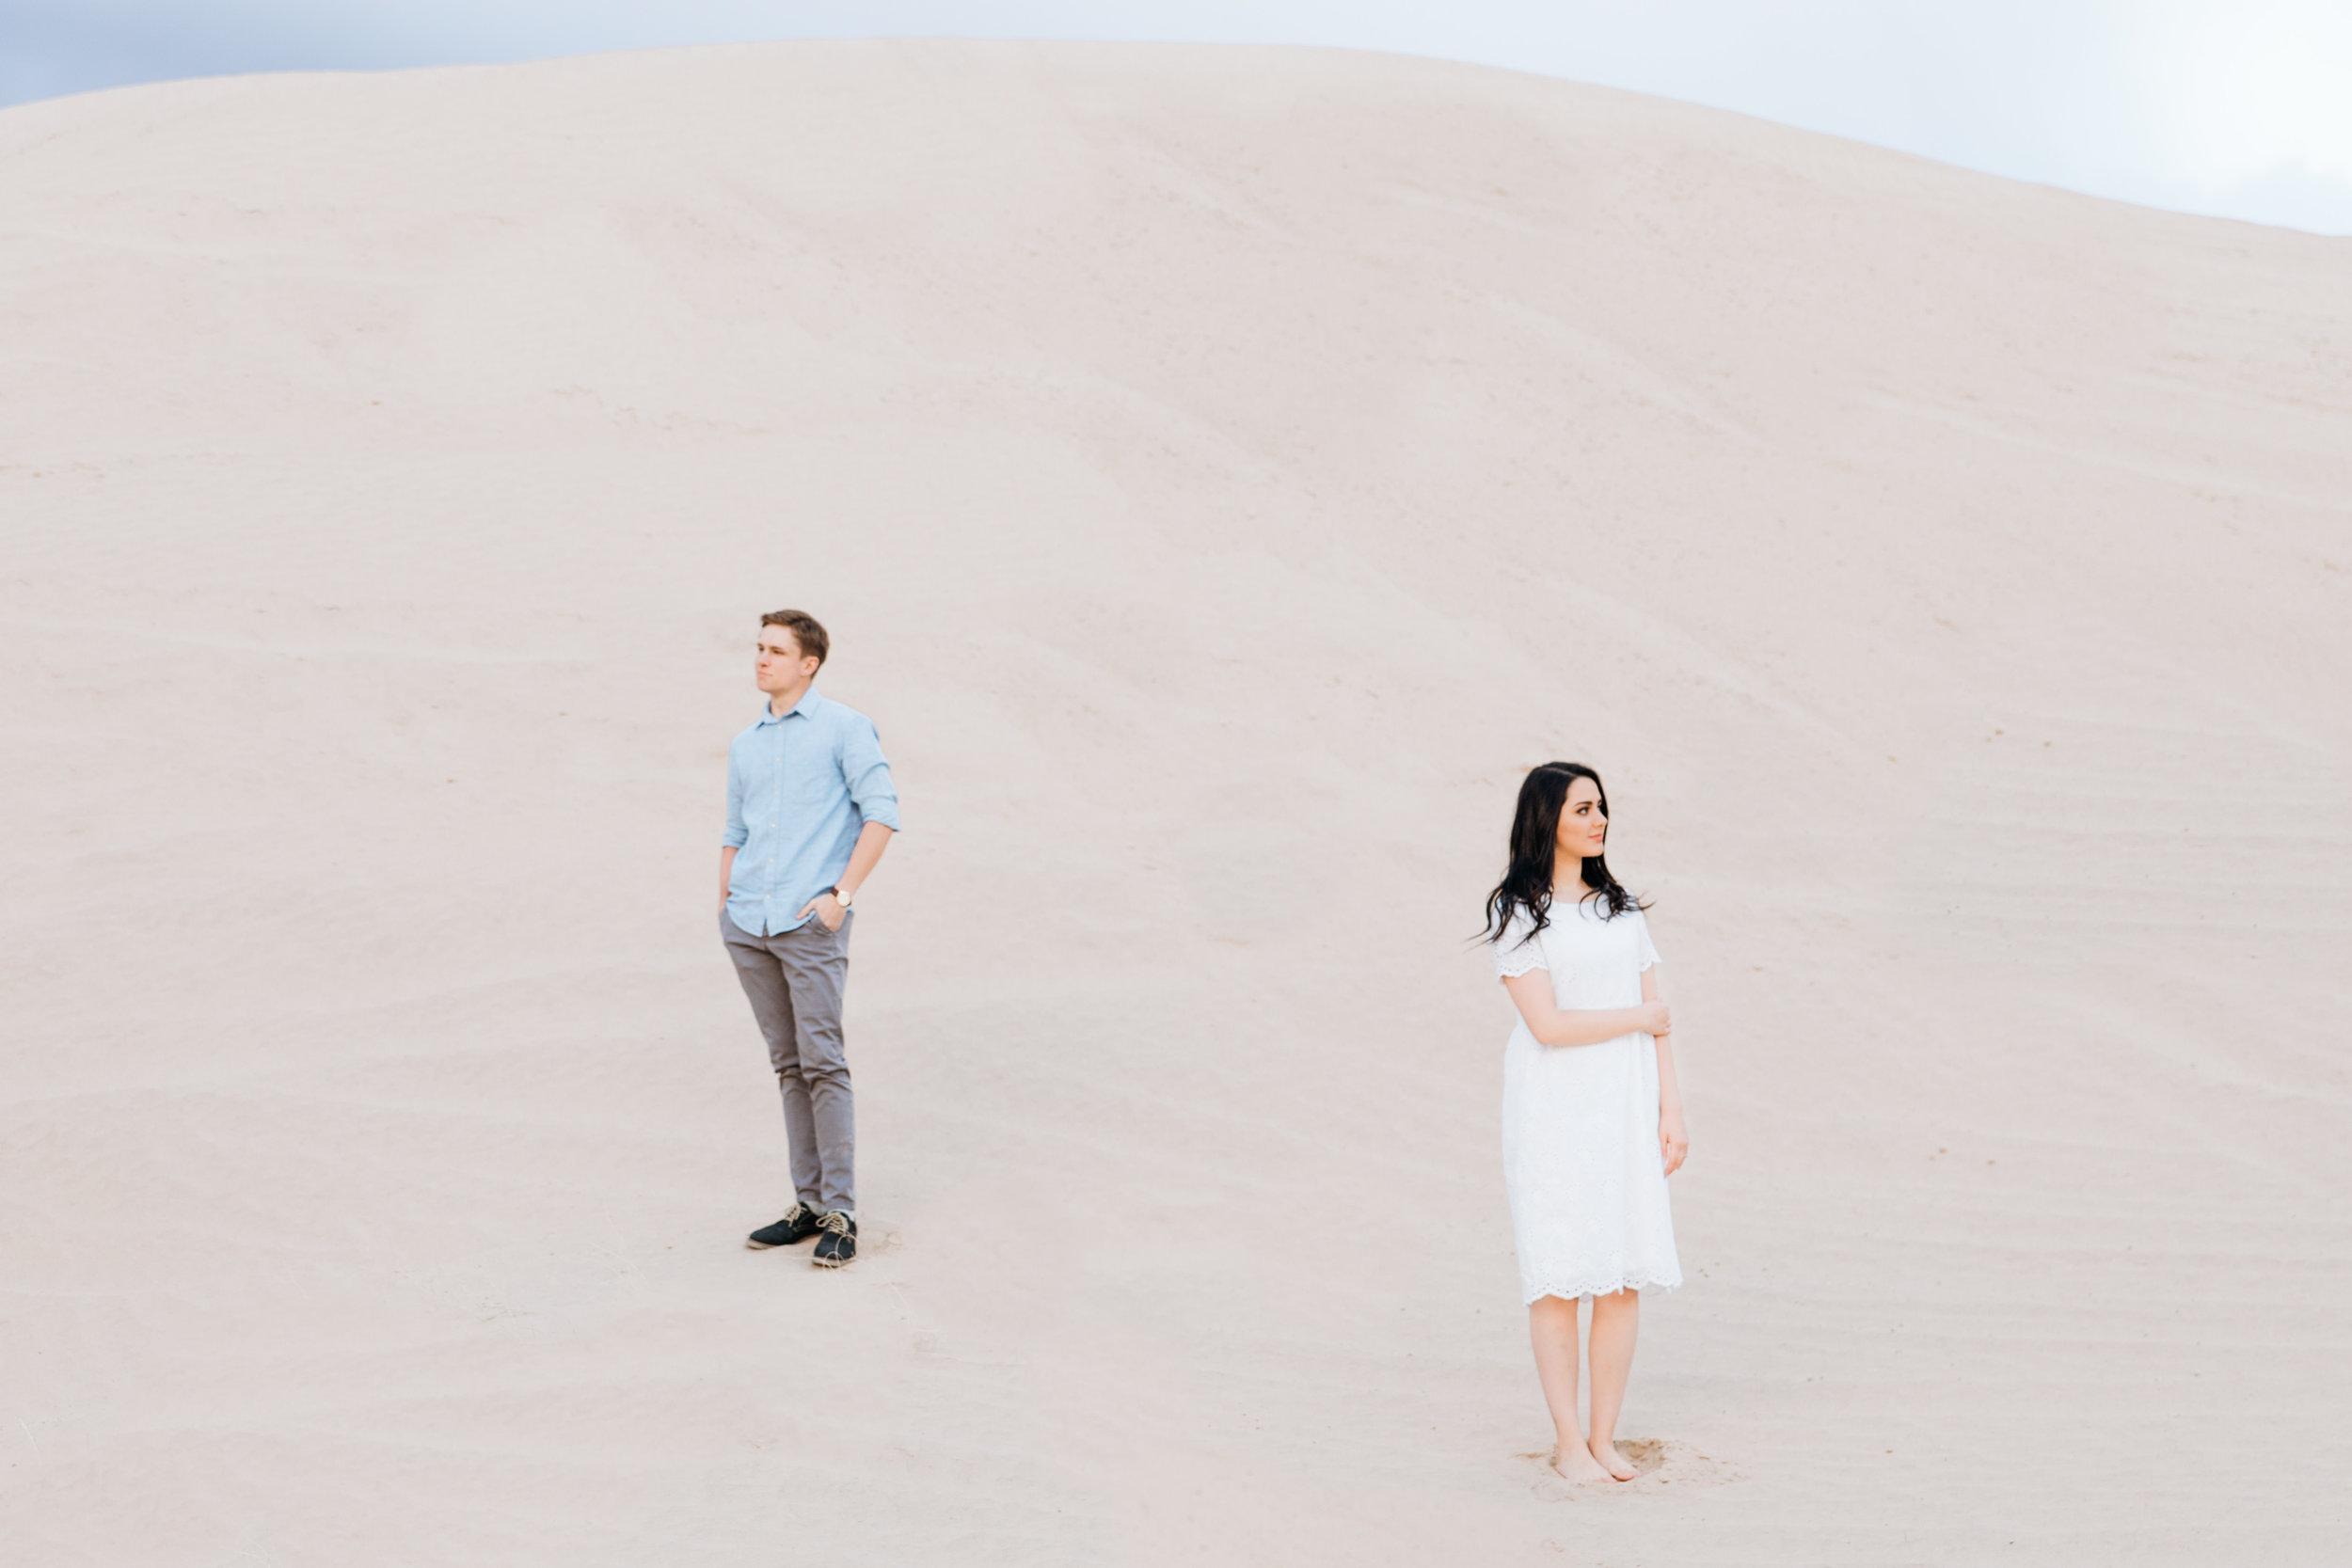 little-sahara-recreation-area-elopement-engagement-wedding-photography-michael-cozzens-79.jpg